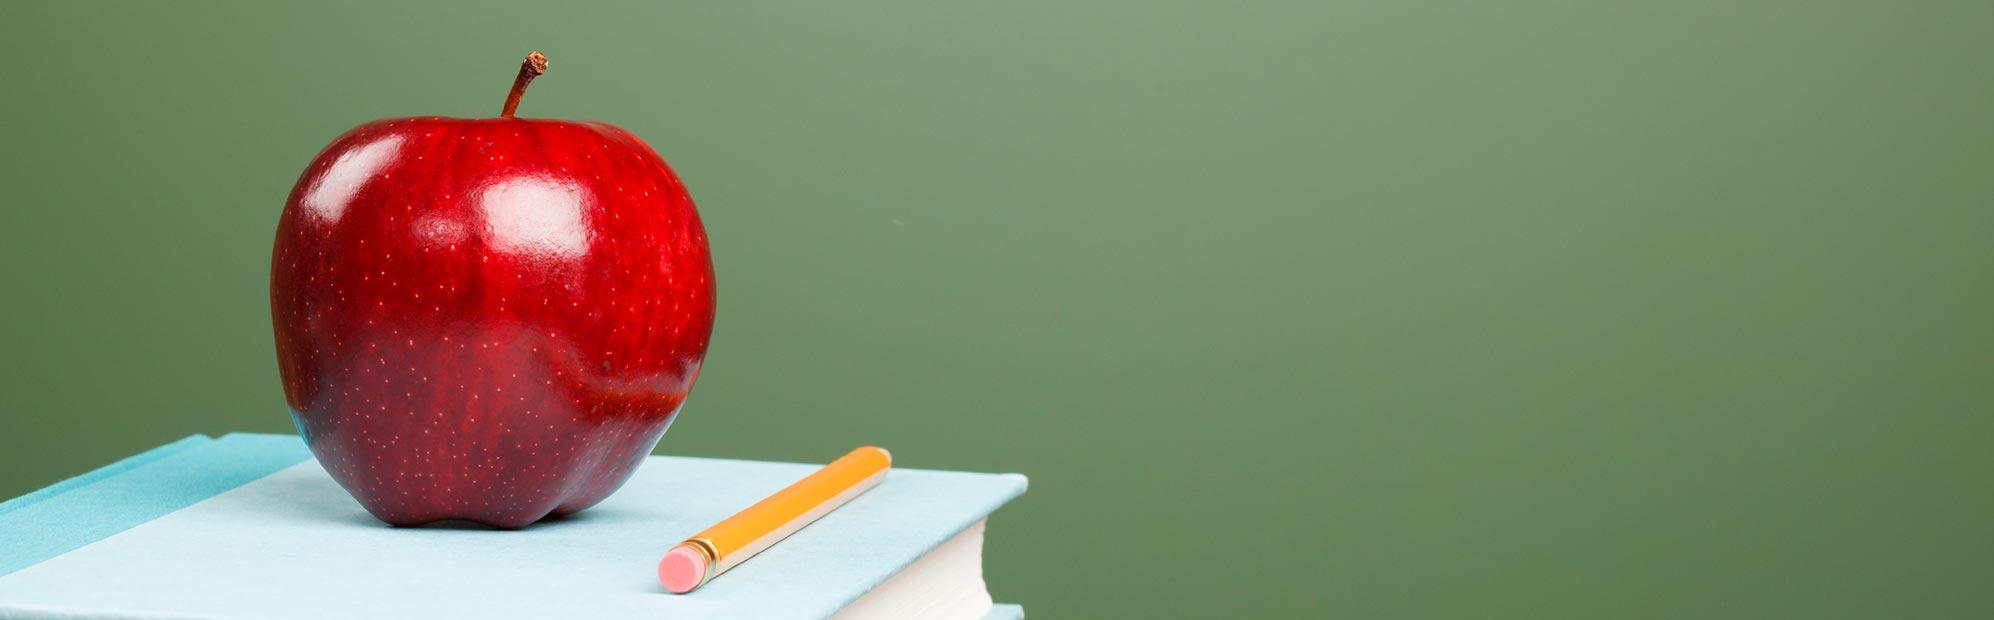 How To Make Your Google Calendar Private 25 Legit Ways To Make Money Online Blogging With Wordpress Classroom Websites Wordpress